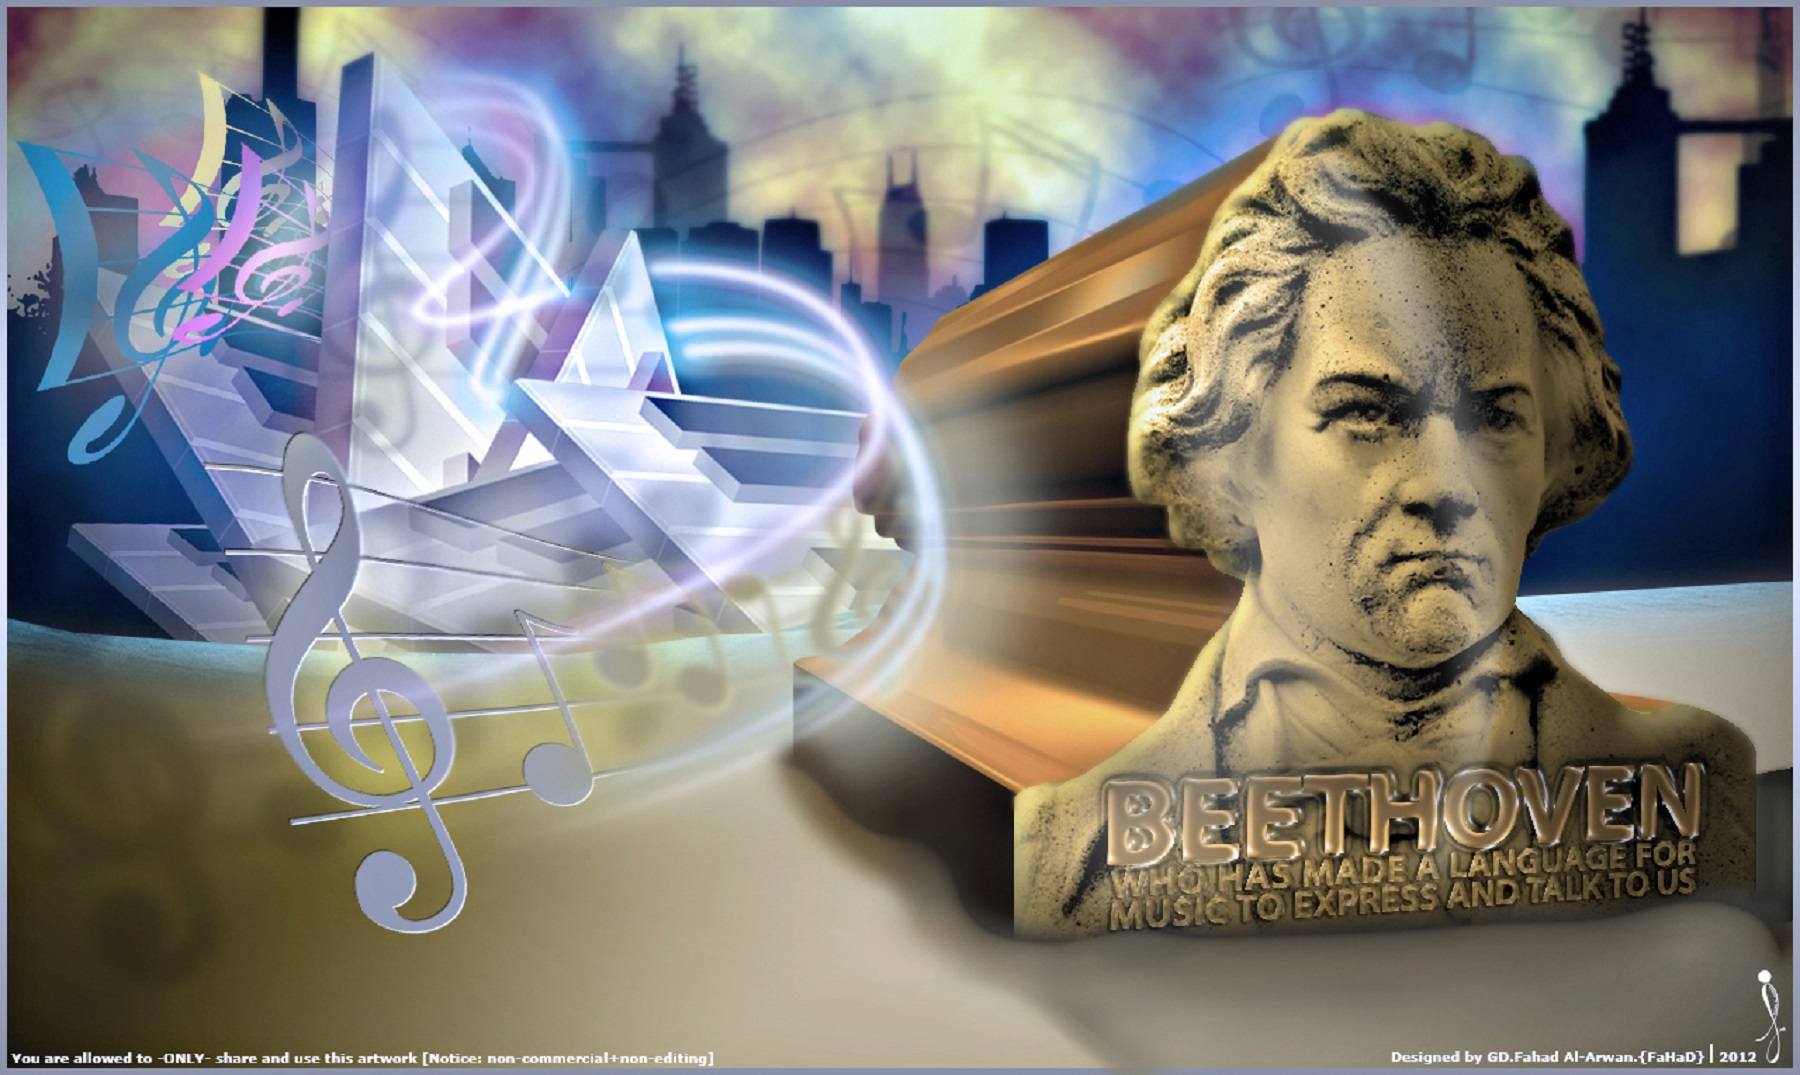 Datos curiosos de Beethoven